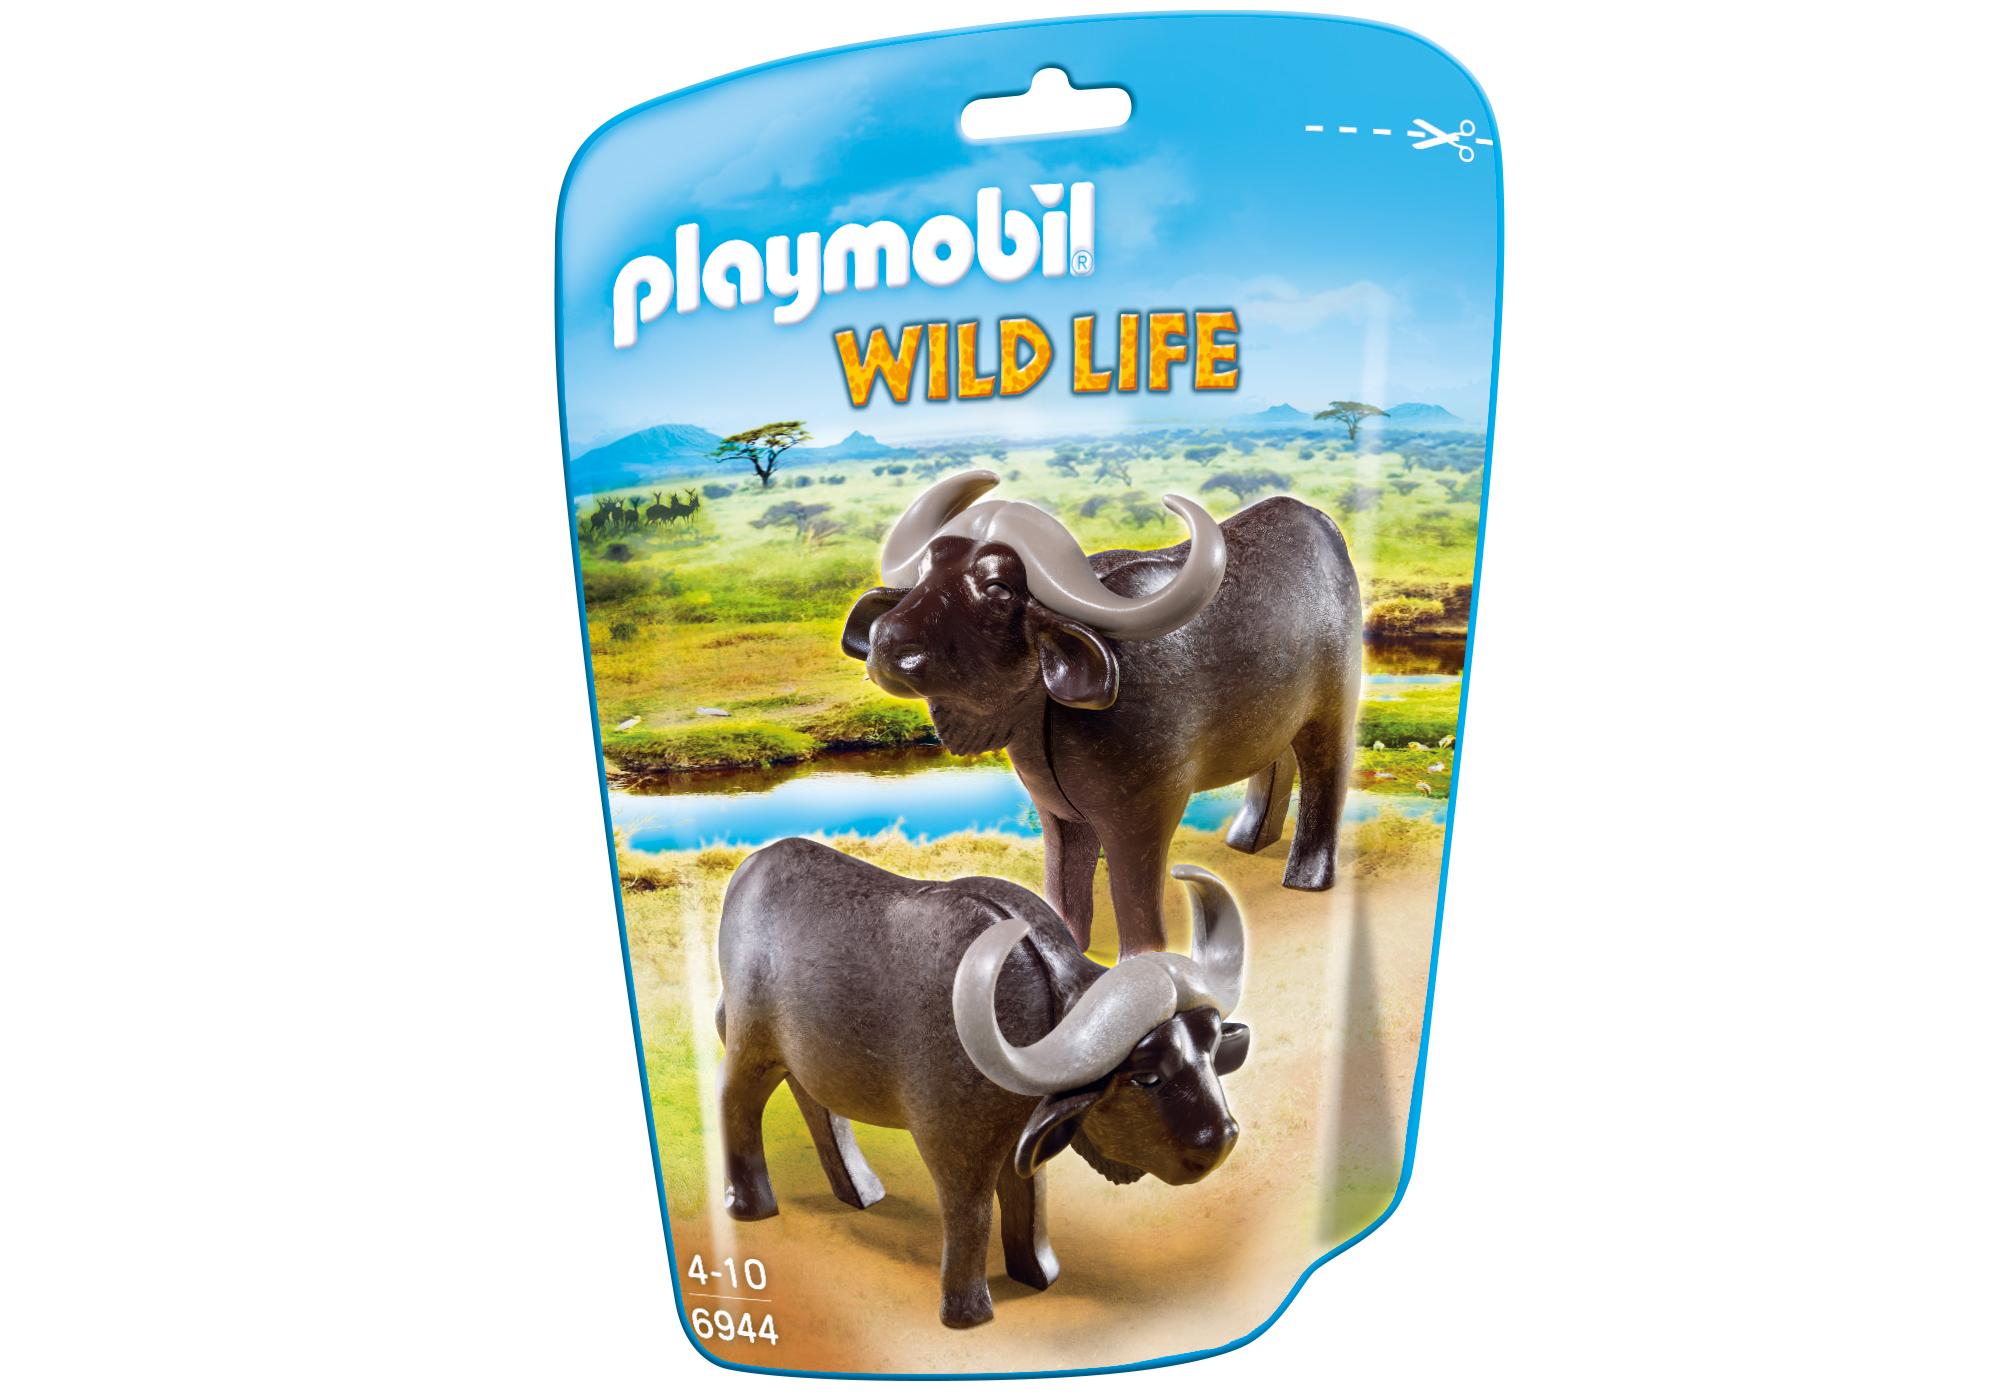 http://media.playmobil.com/i/playmobil/6944_product_box_front